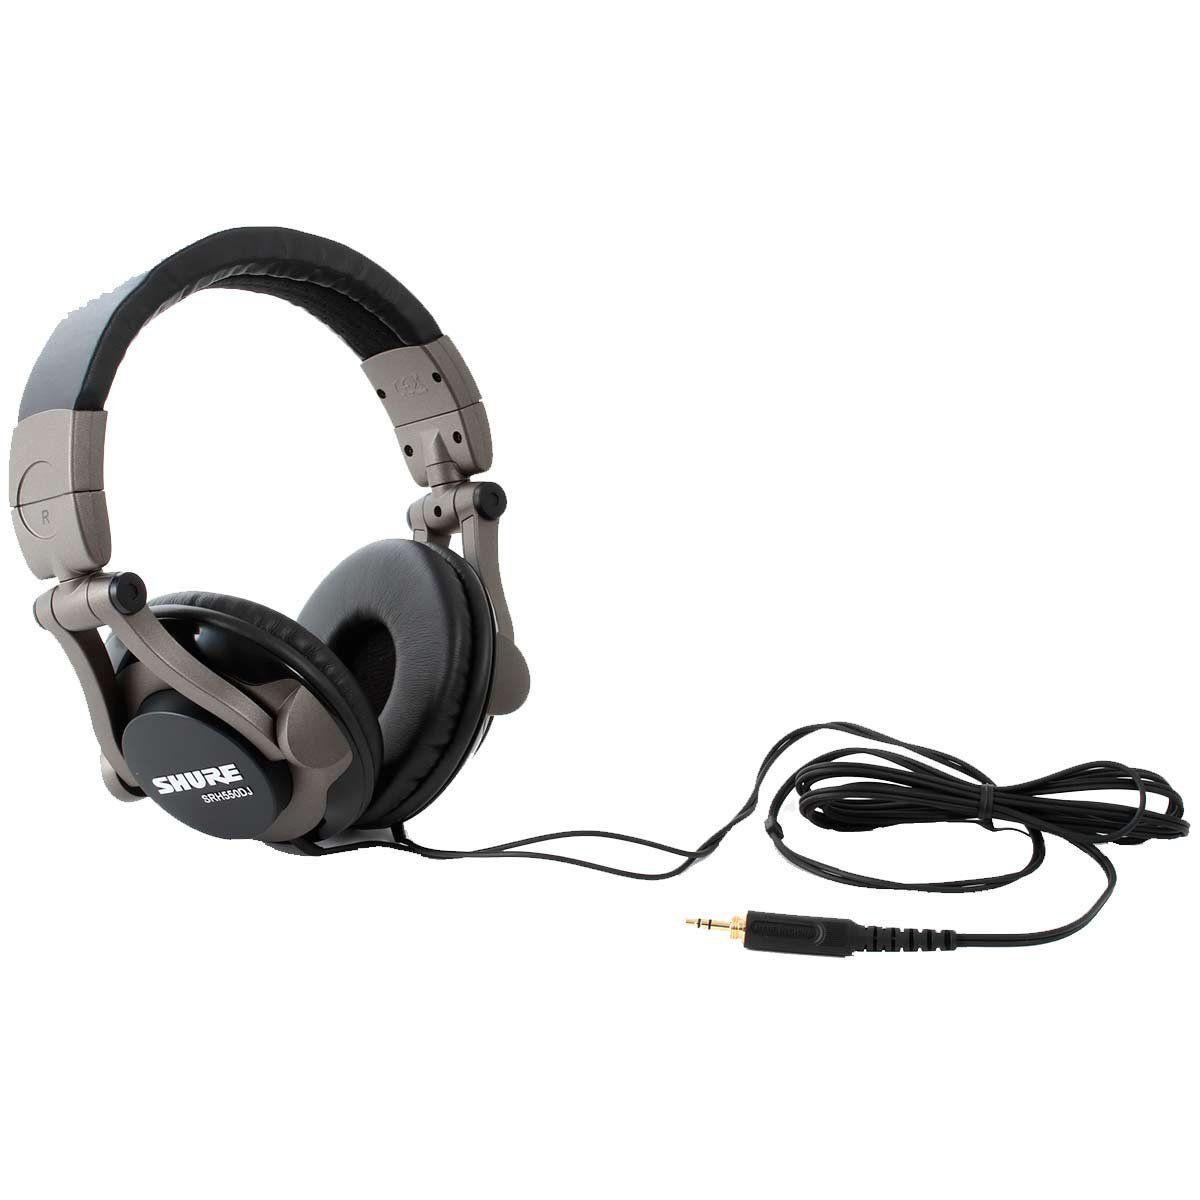 Fone de Ouvido Headphone Dj Preto Shure Srh550